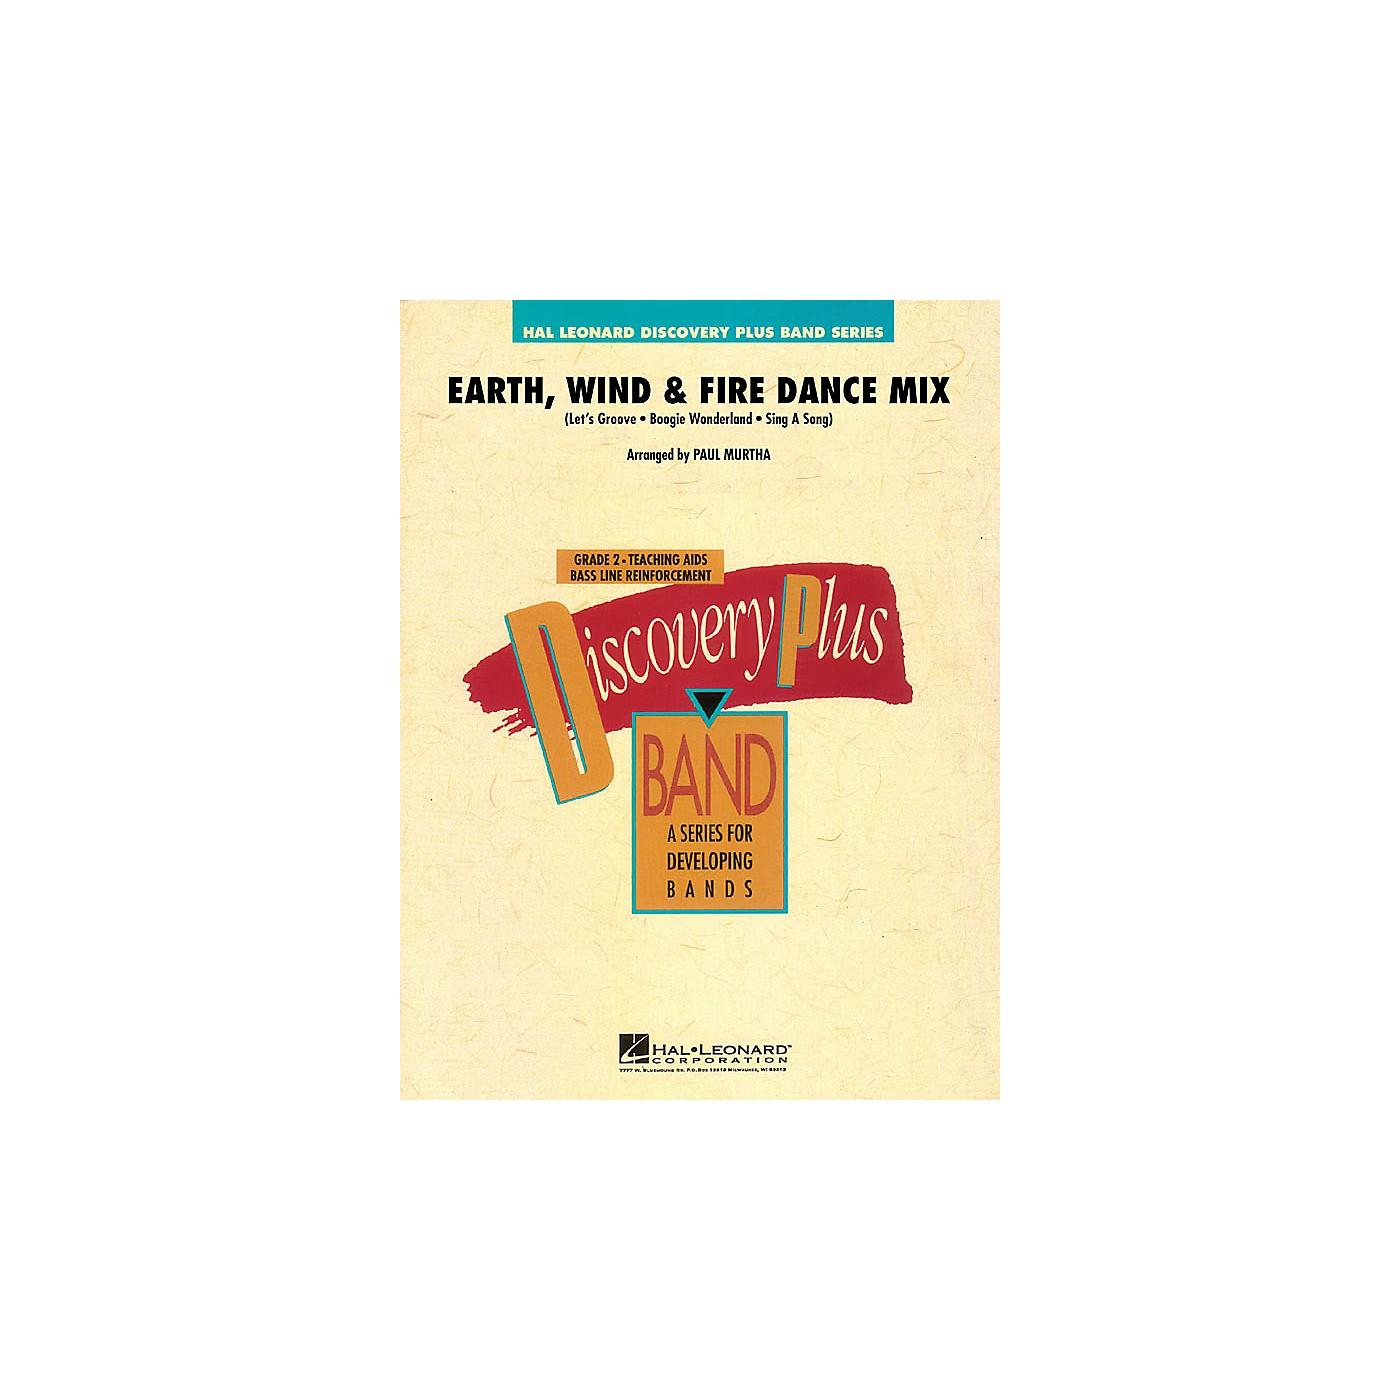 Hal Leonard Earth, Wind & Fire Dance Mix - Discovery Plus Band Level 2 arranged by Paul Murtha thumbnail